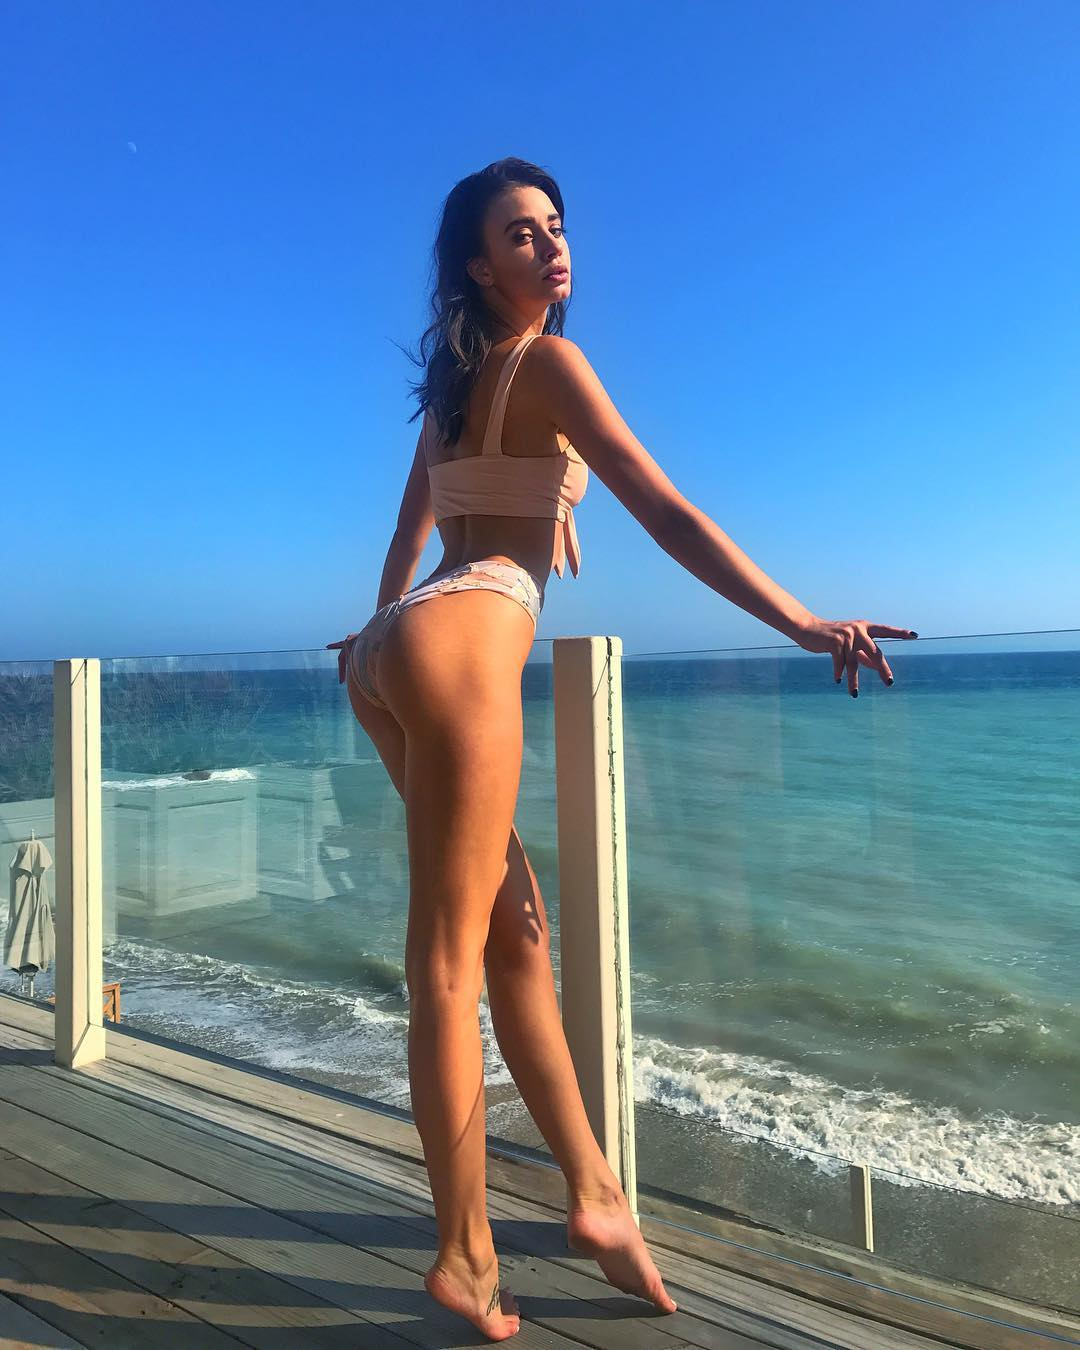 Hot Josey Auguste nudes (63 foto and video), Pussy, Bikini, Selfie, swimsuit 2006